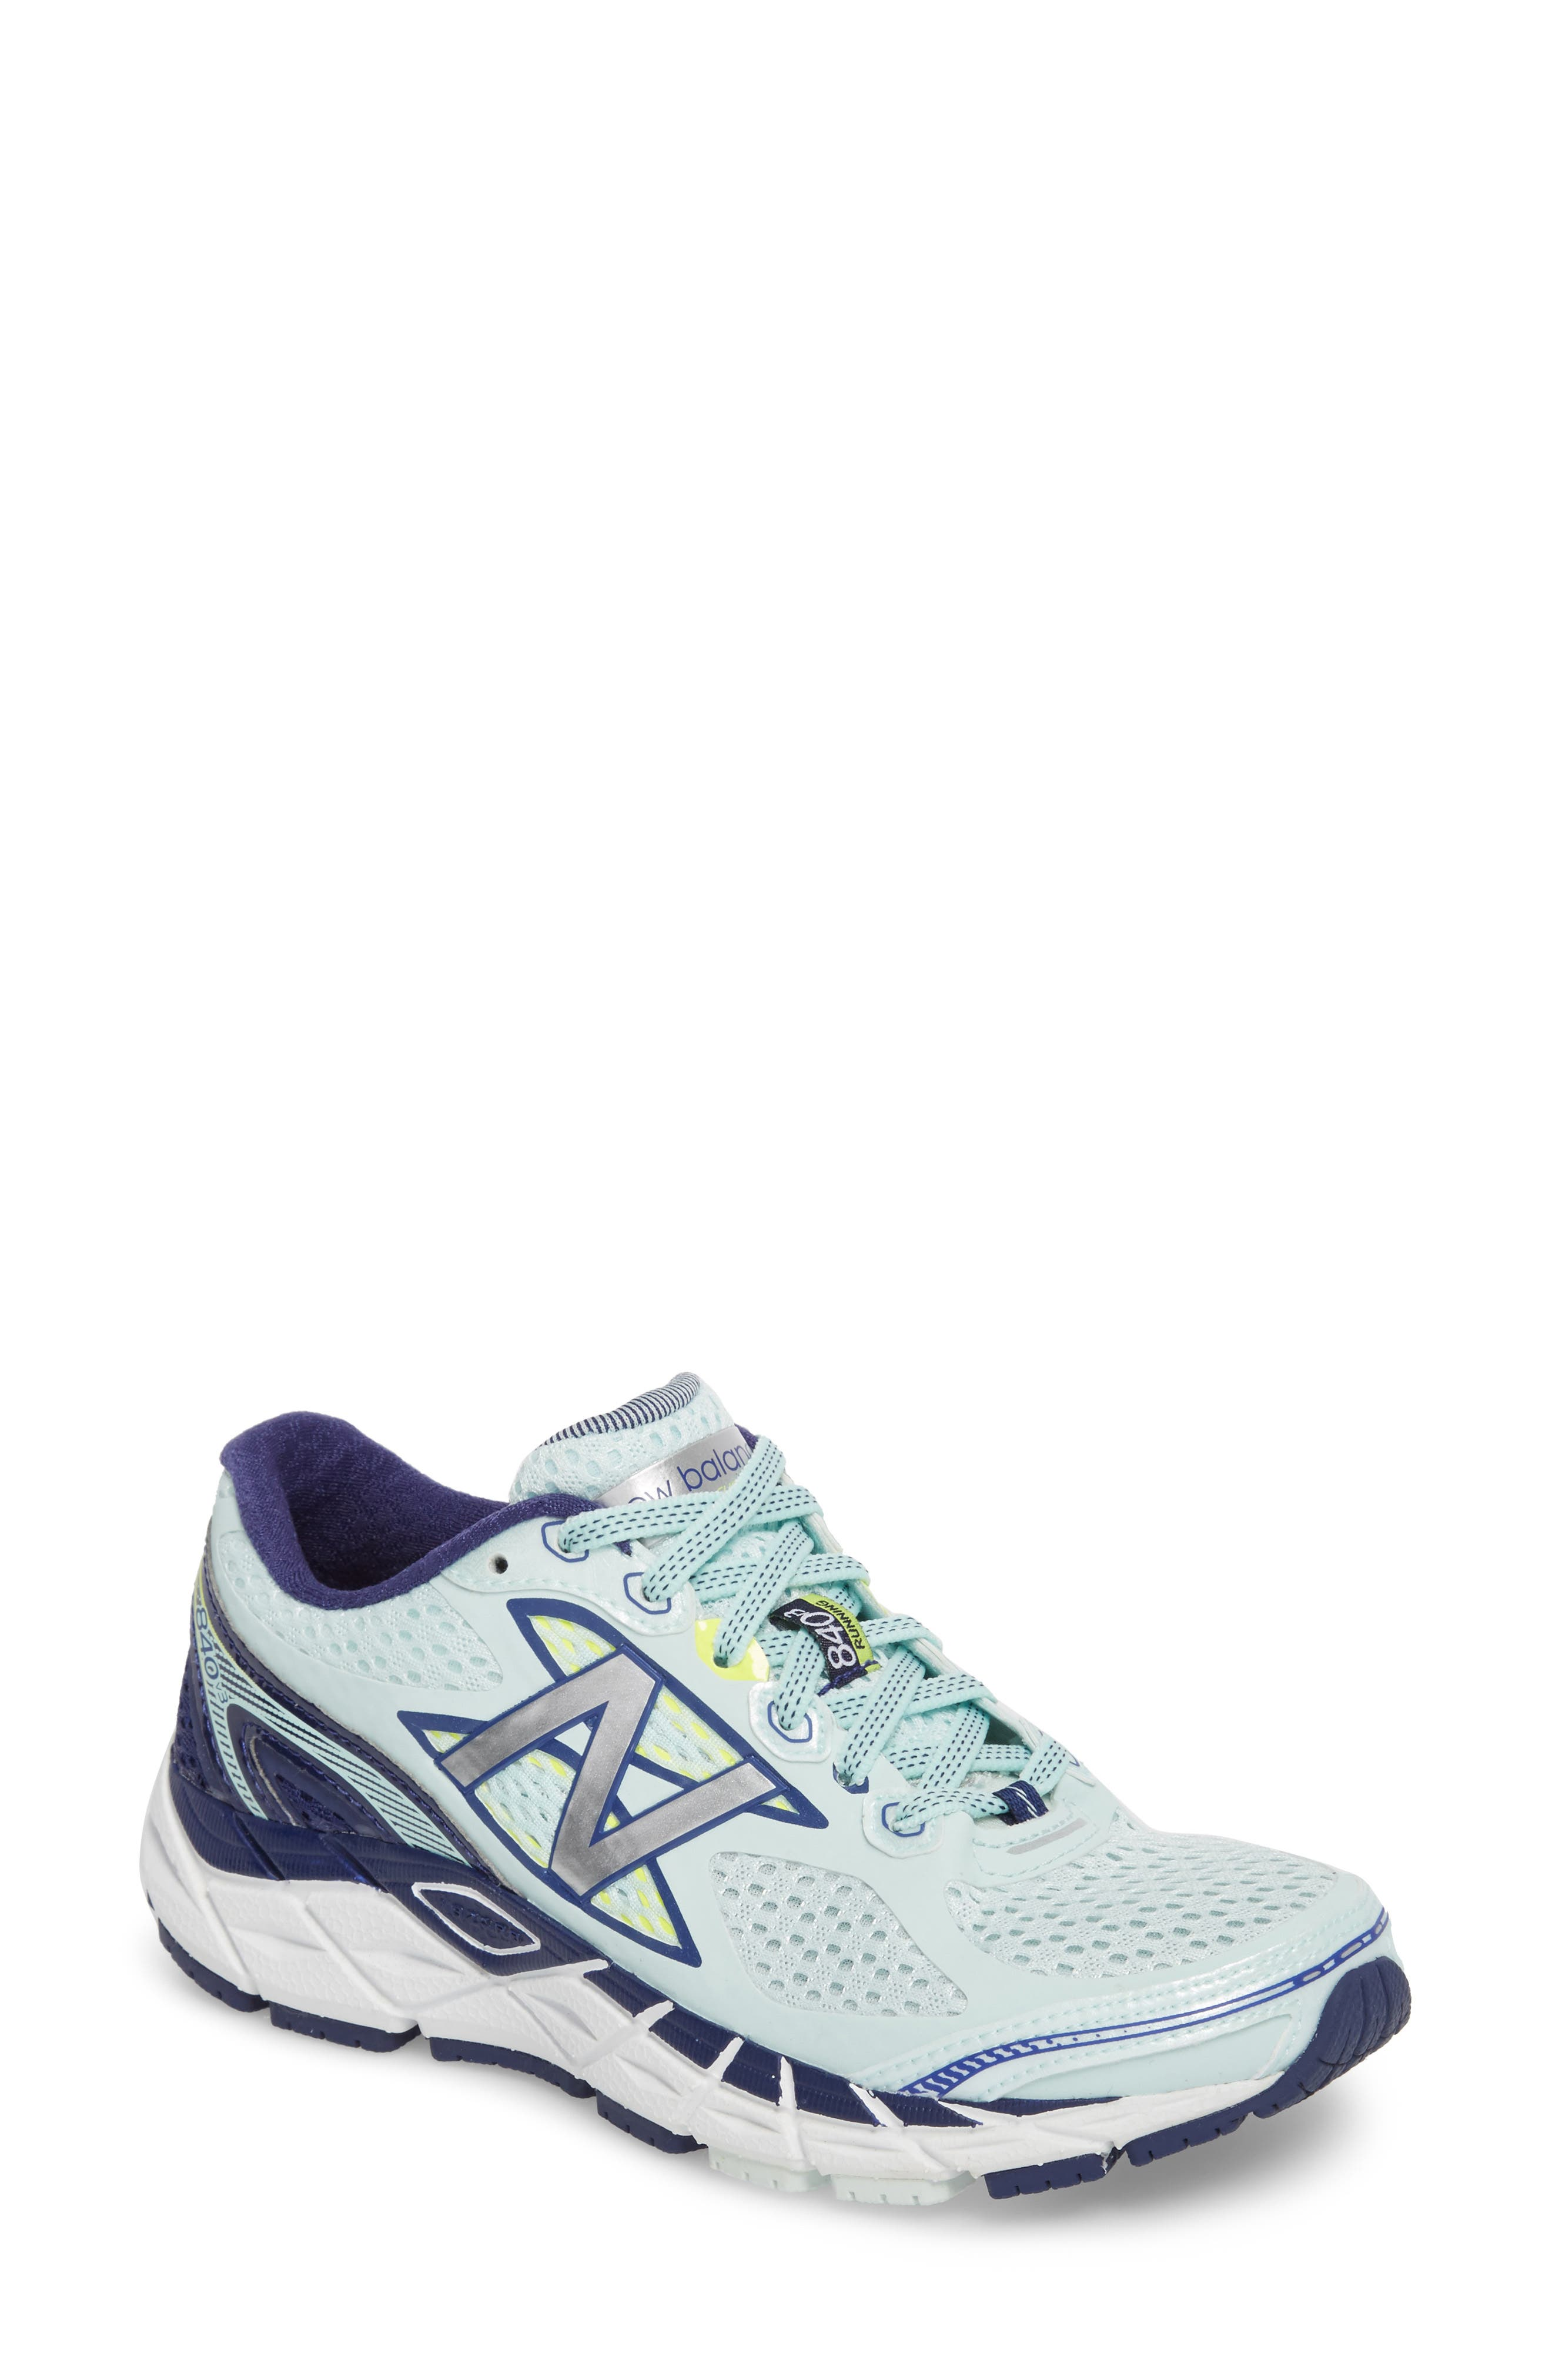 '840v3' Running Shoe,                             Main thumbnail 1, color,                             DROPLET